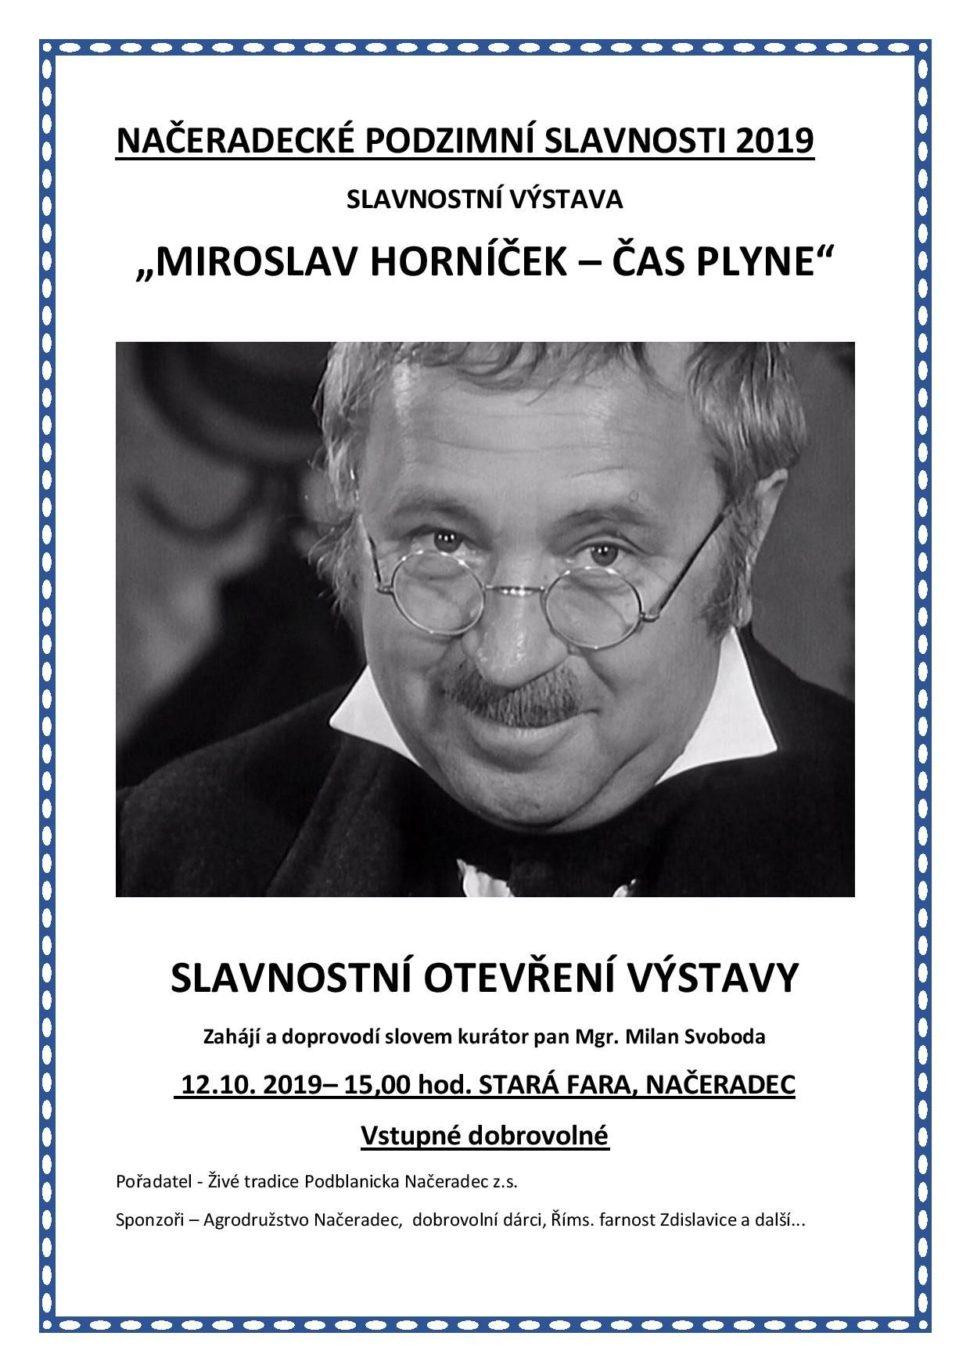 Miroslav Horníček výstava